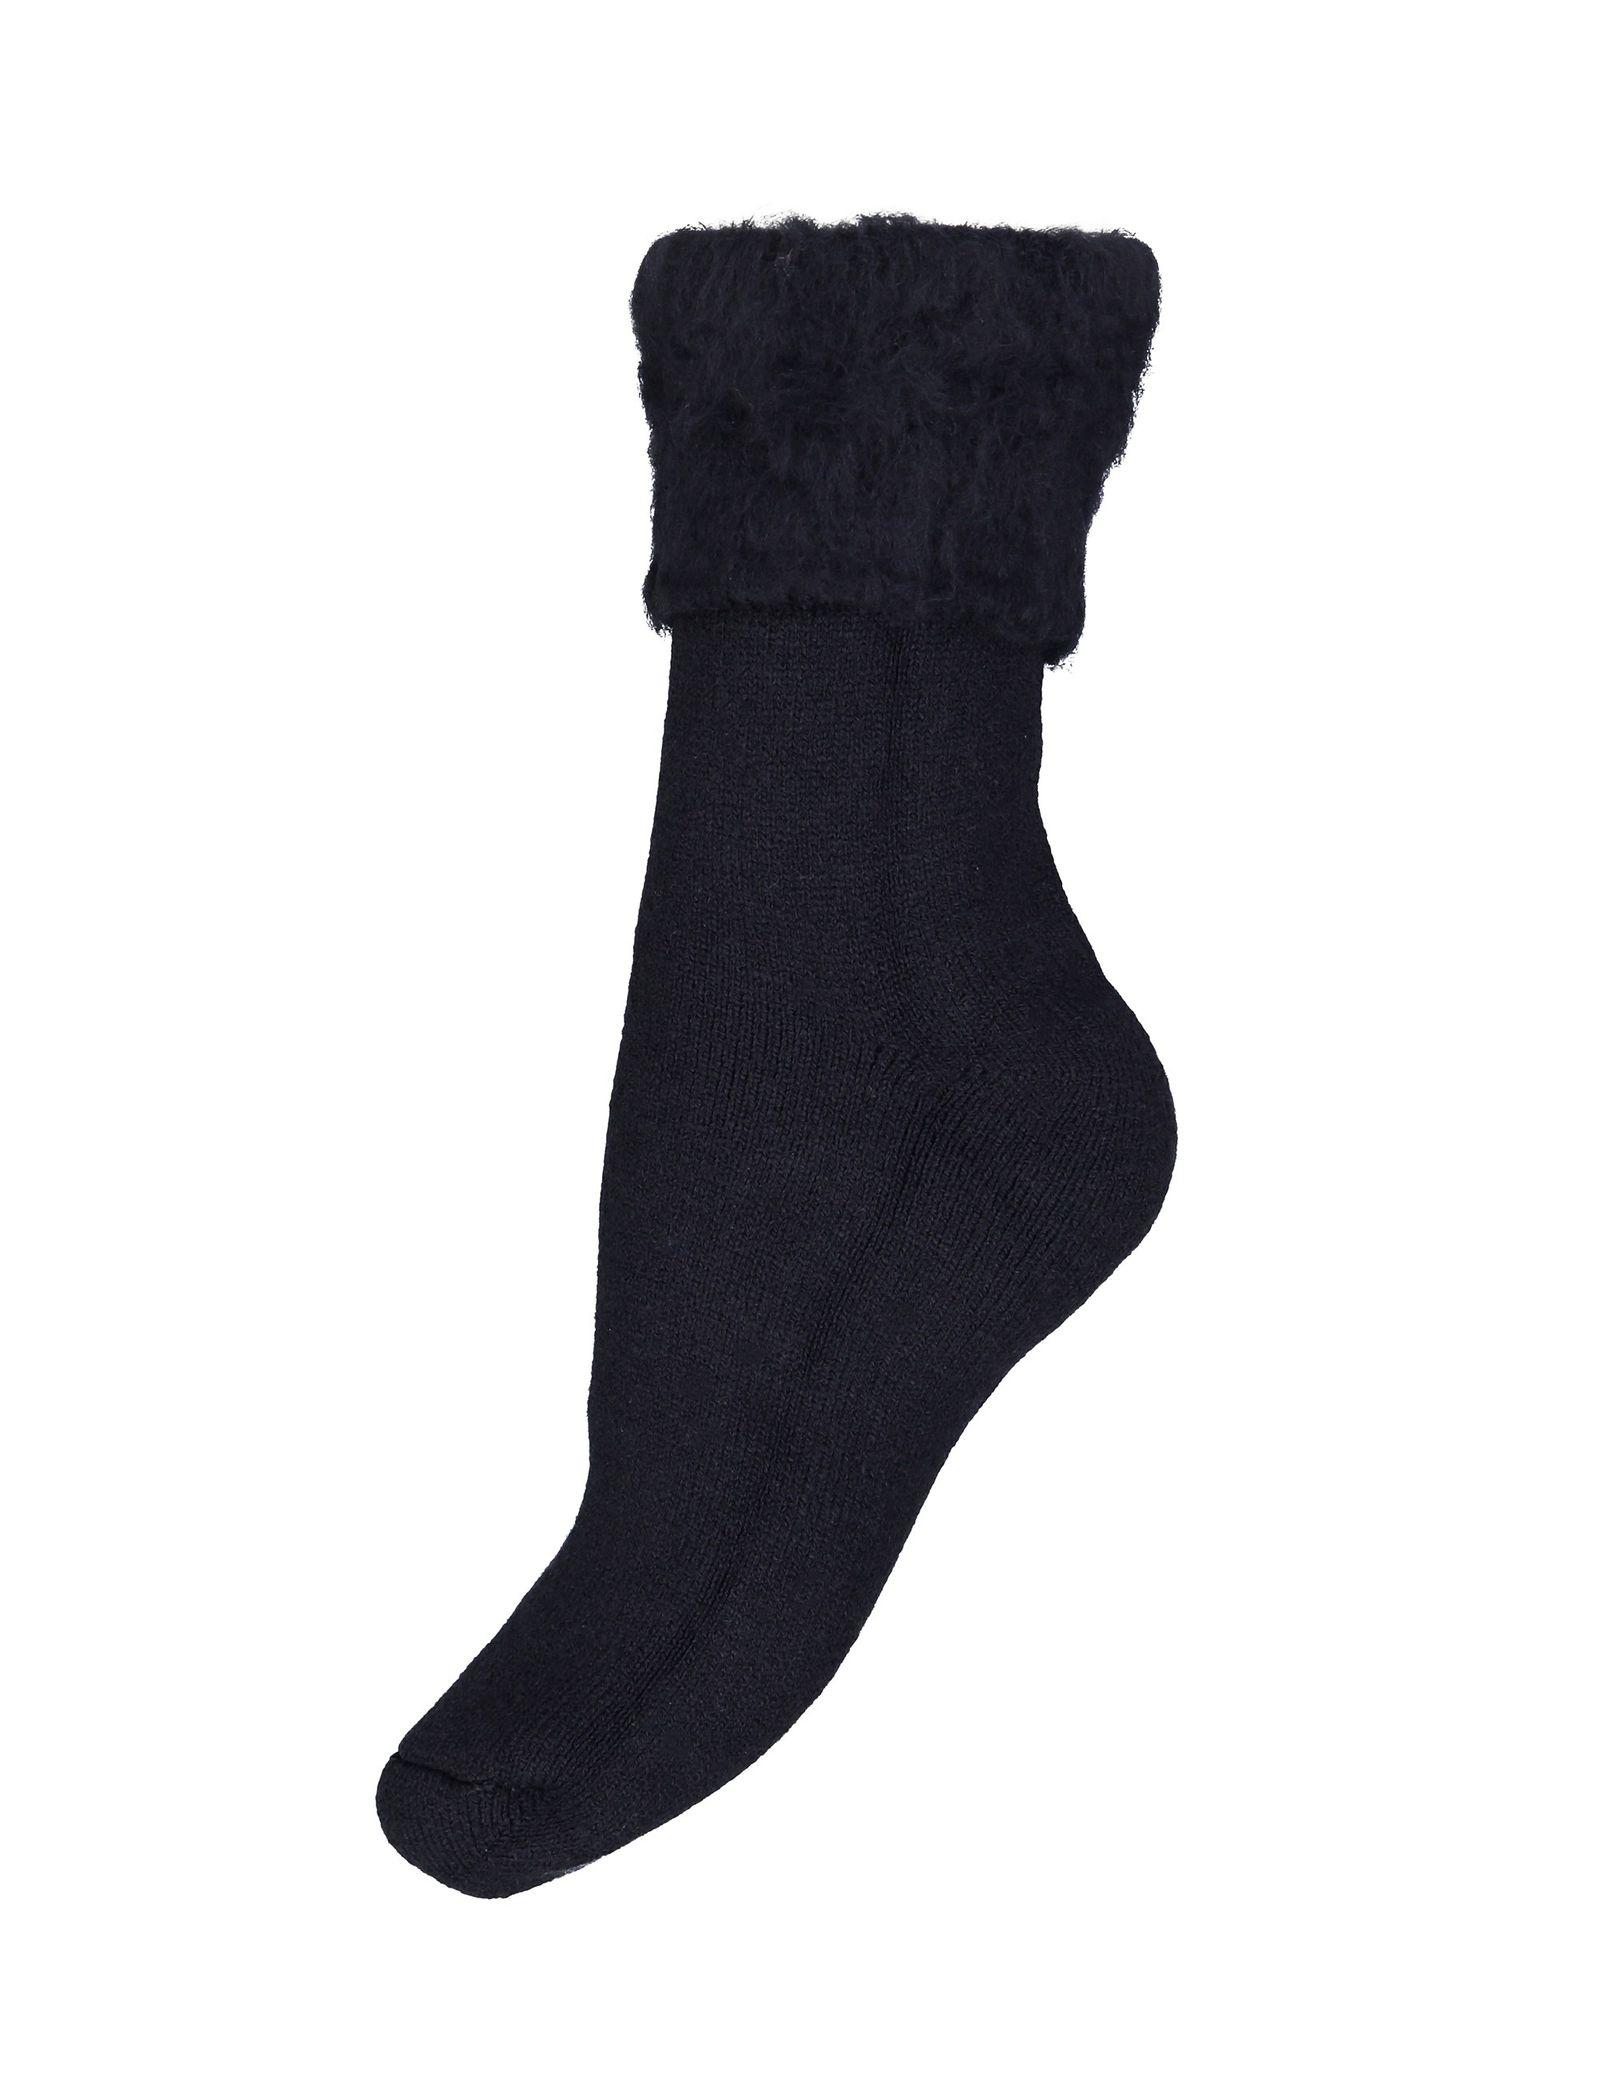 جوراب ساق متوسط زنانه - دفکتو - سرمه اي - 2